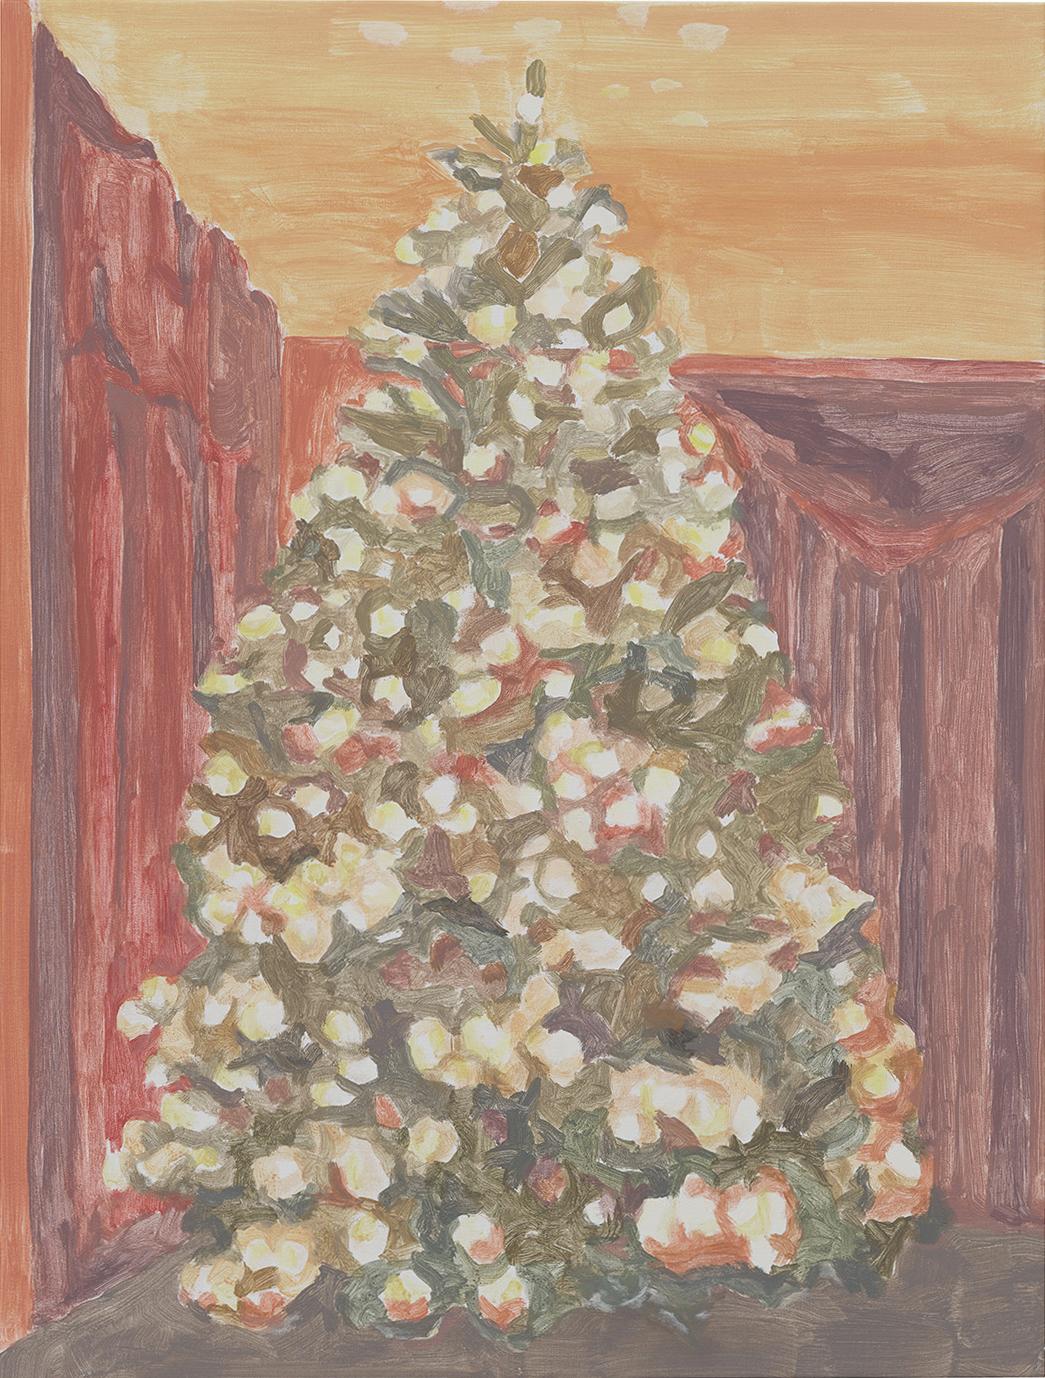 Xmas Tree (velvet curtains), acrylic on canvas, 32 x 24.25 inches, 2016.